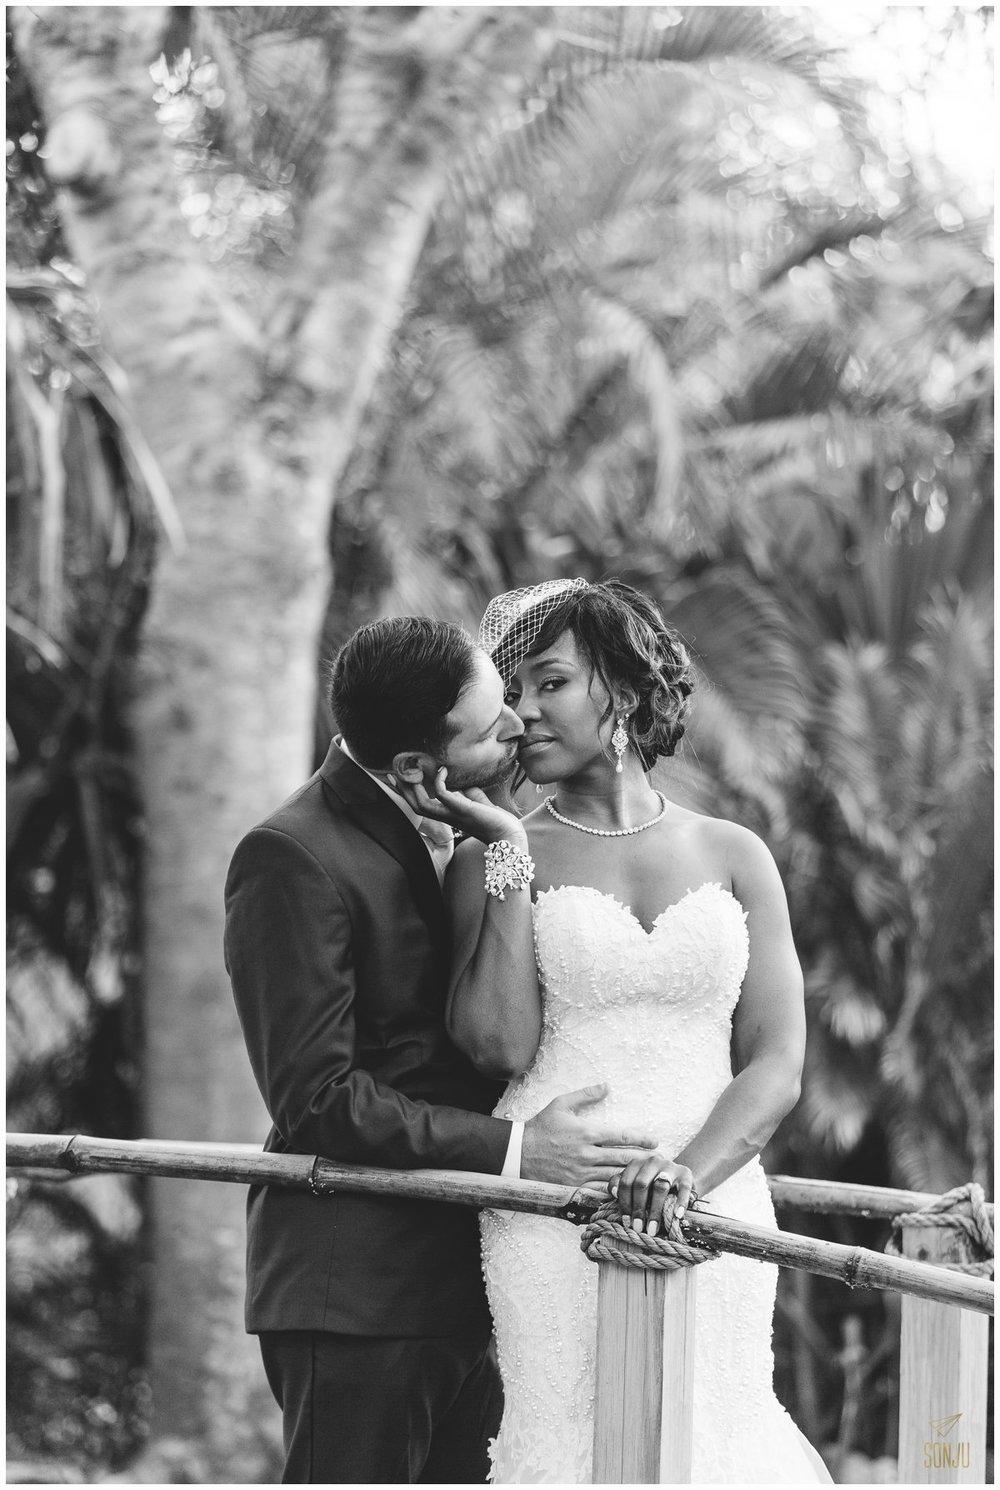 Bamboo-gallery-ft-lauderdale-wedding-tamique-bryan00035.jpg